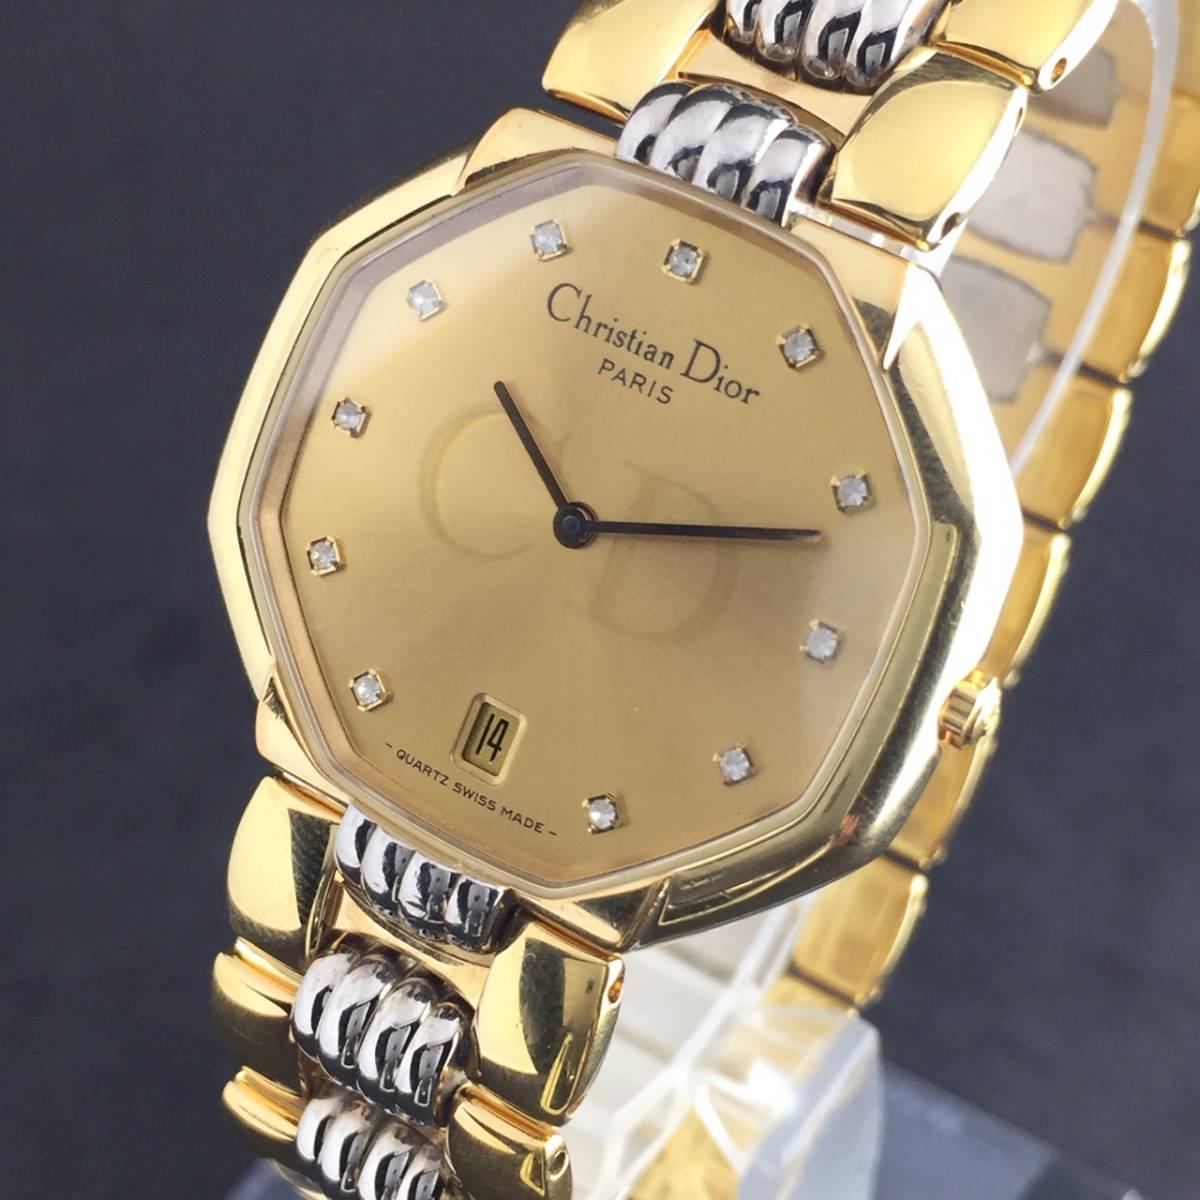 huge discount 7fcc3 82eca ディオール 時計 ダイヤの値段と価格推移は?|13件の売買情報を ...